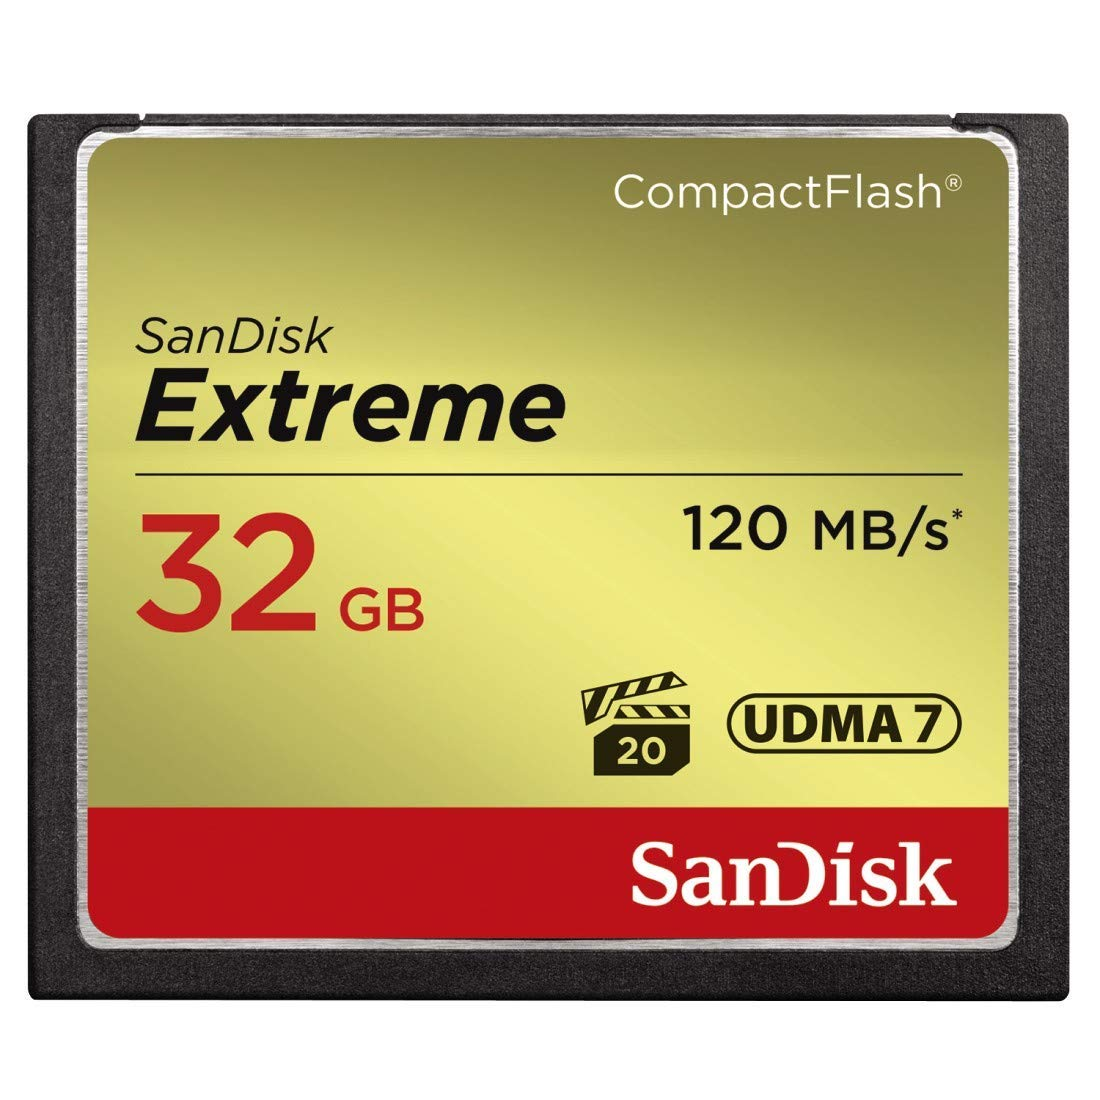 SanDisk Extreme UDMA7 - Tarjeta CompactFlash (32 GB), Color ...